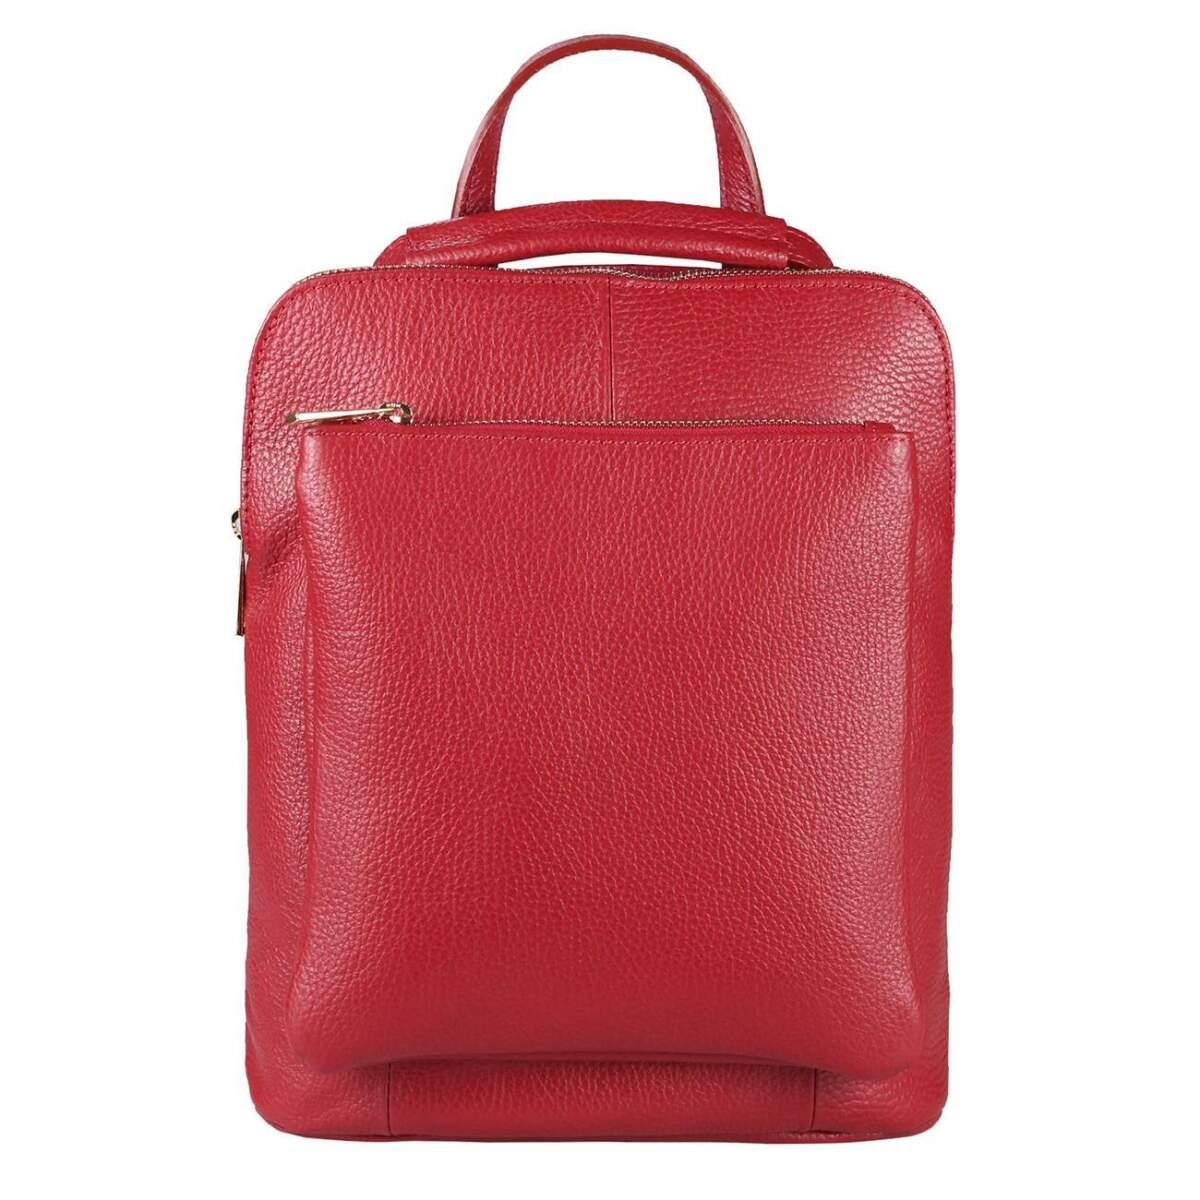 obc made in italy damen echt leder rucksack daypack lederrucksack tasche schultertasche. Black Bedroom Furniture Sets. Home Design Ideas